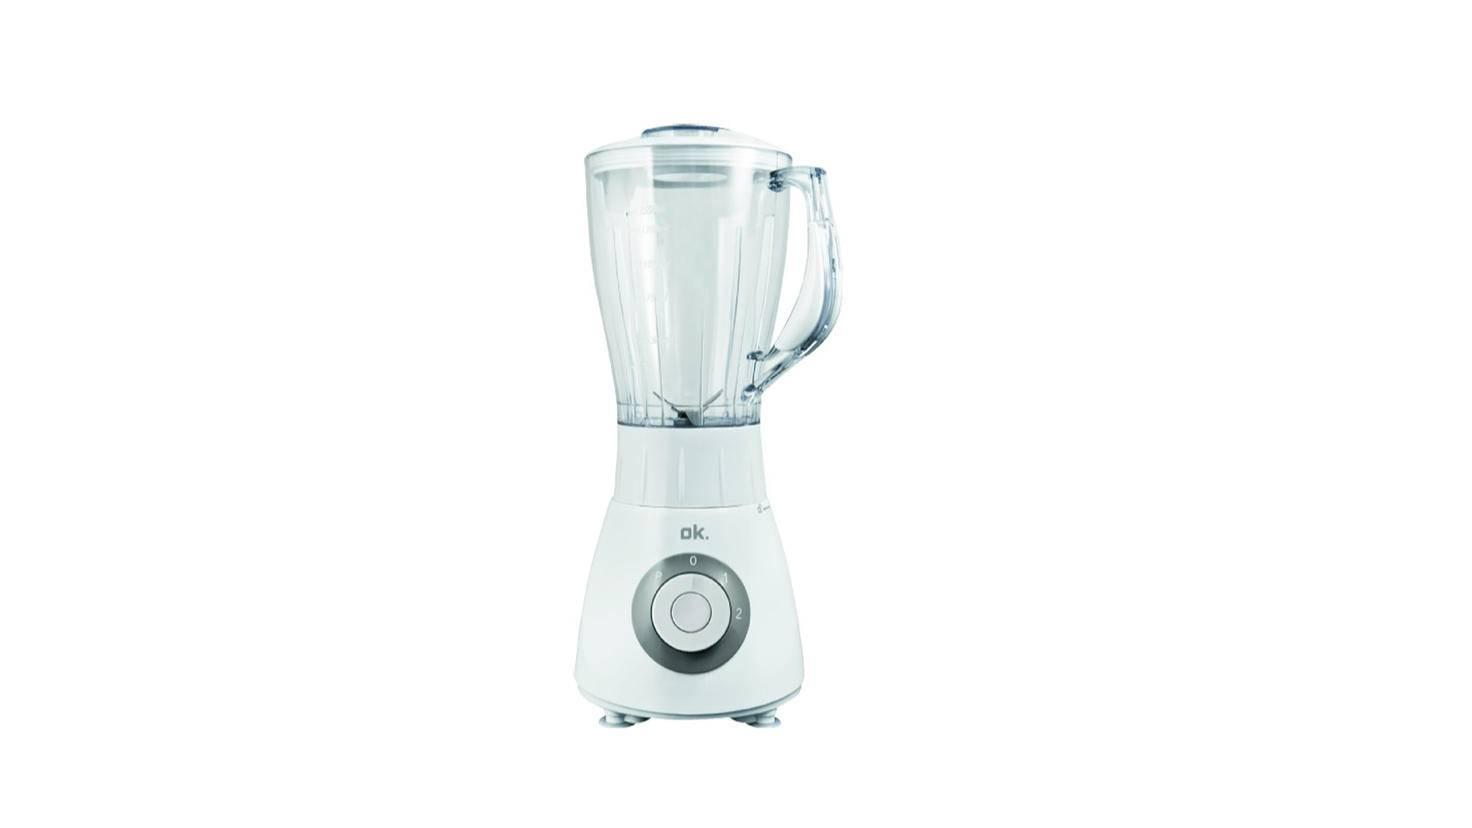 ok stand mixer OMX 2210 W